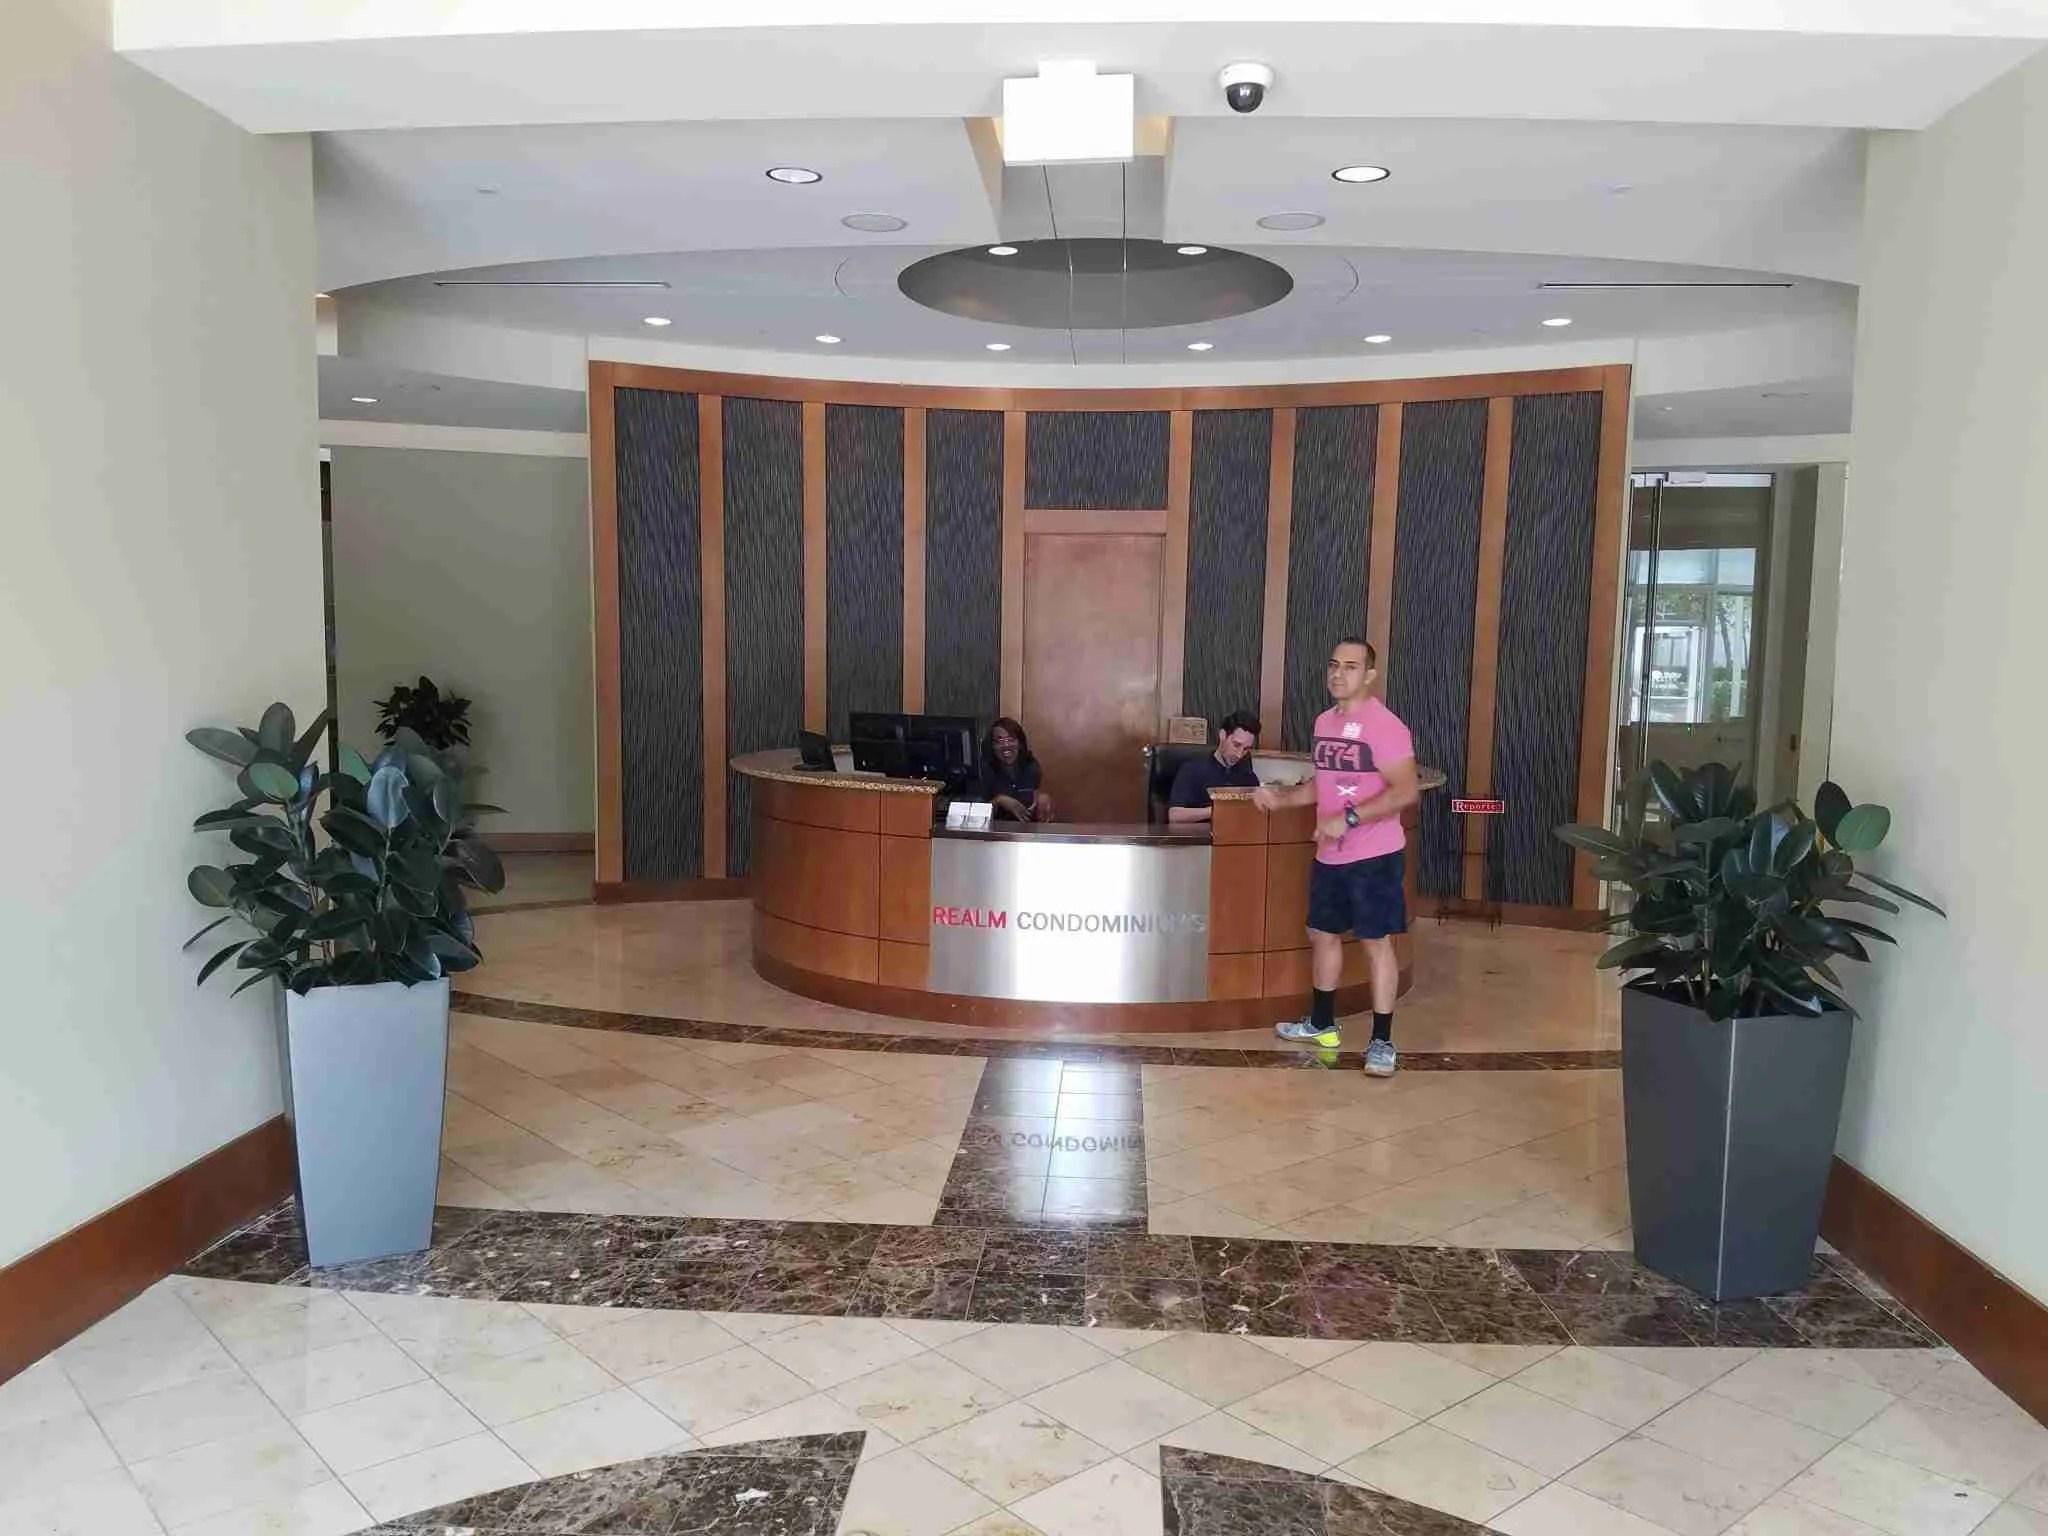 The Realm Condominium of Buckhead Entrance Lobby and Concierge Desk